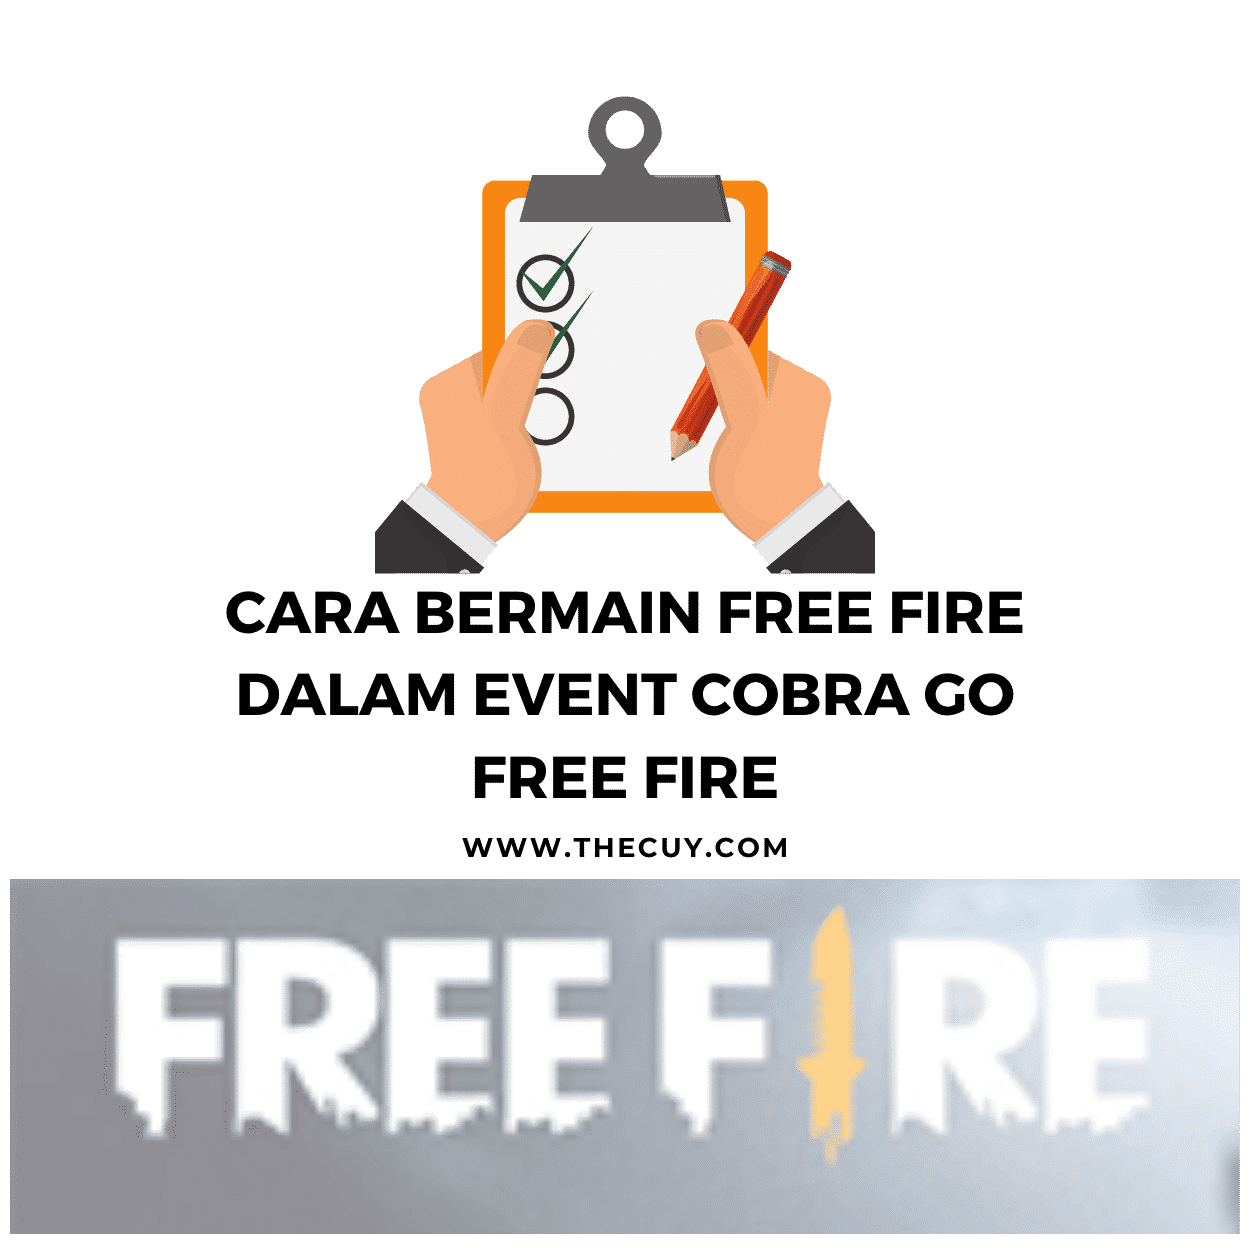 Cara Bermain Free Fire Dalam Event Cobra Go Free Fire